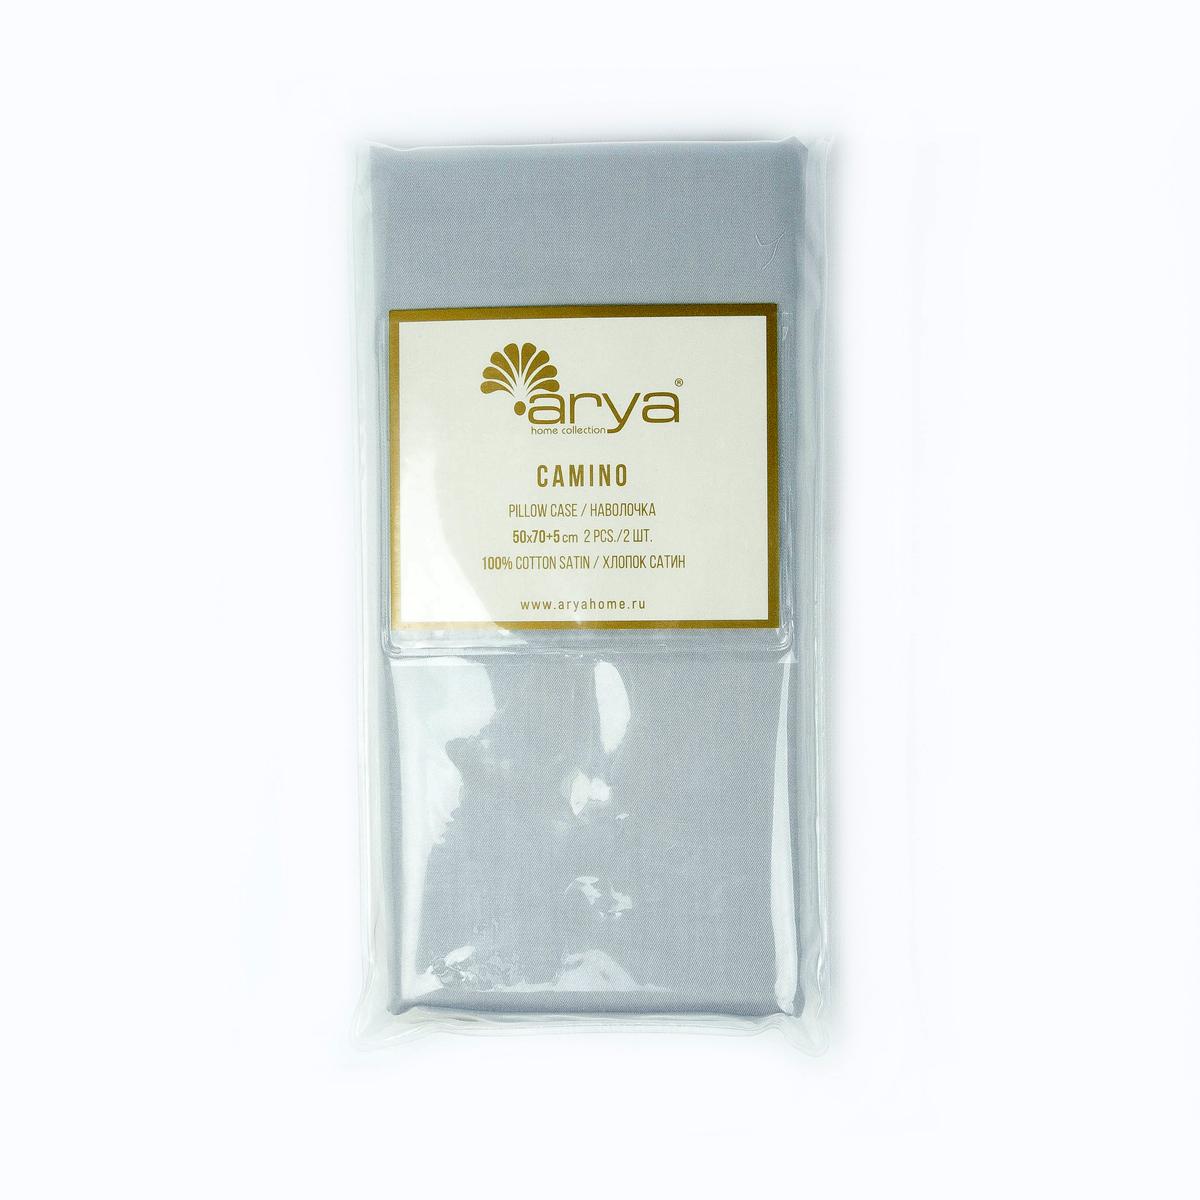 Купить Наволочки Arya, Наволочка Camino Цвет: Серый (50х70 (2 шт)), Турция, Хлопковый сатин